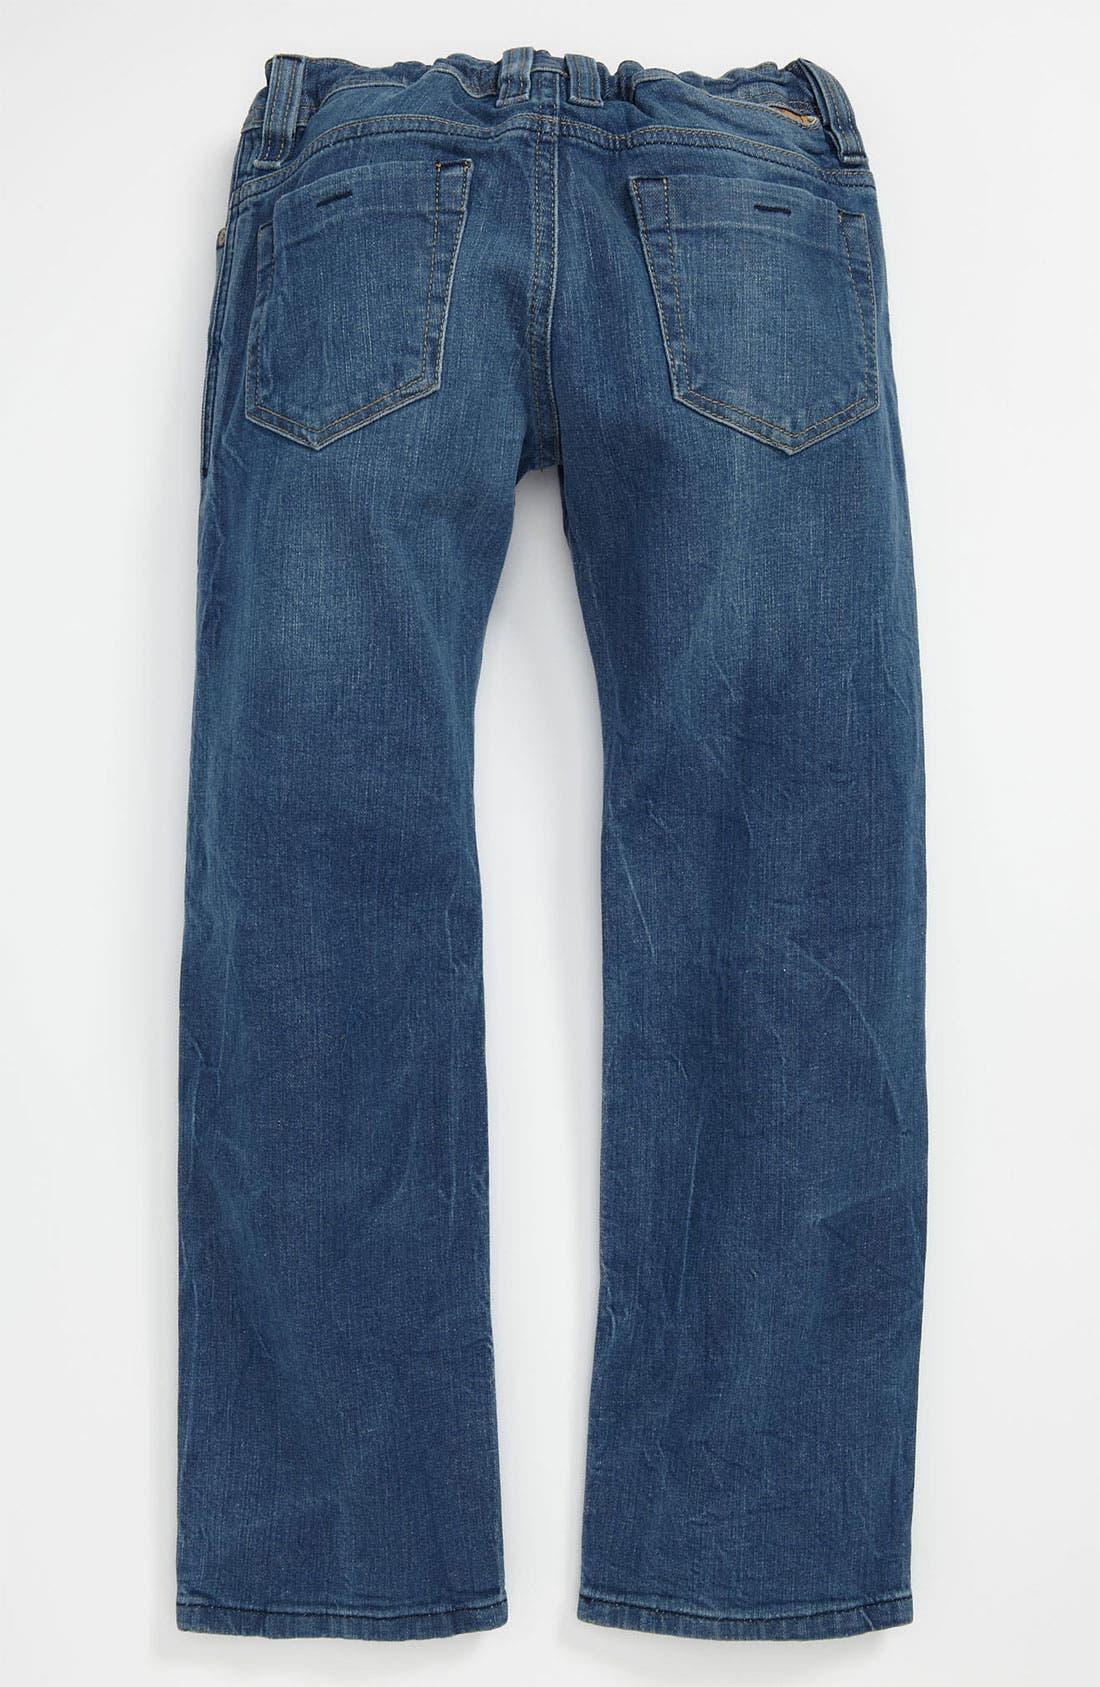 Alternate Image 1 Selected - DIESEL® 'Safado' Jeans (Little Boys & Big Boys)